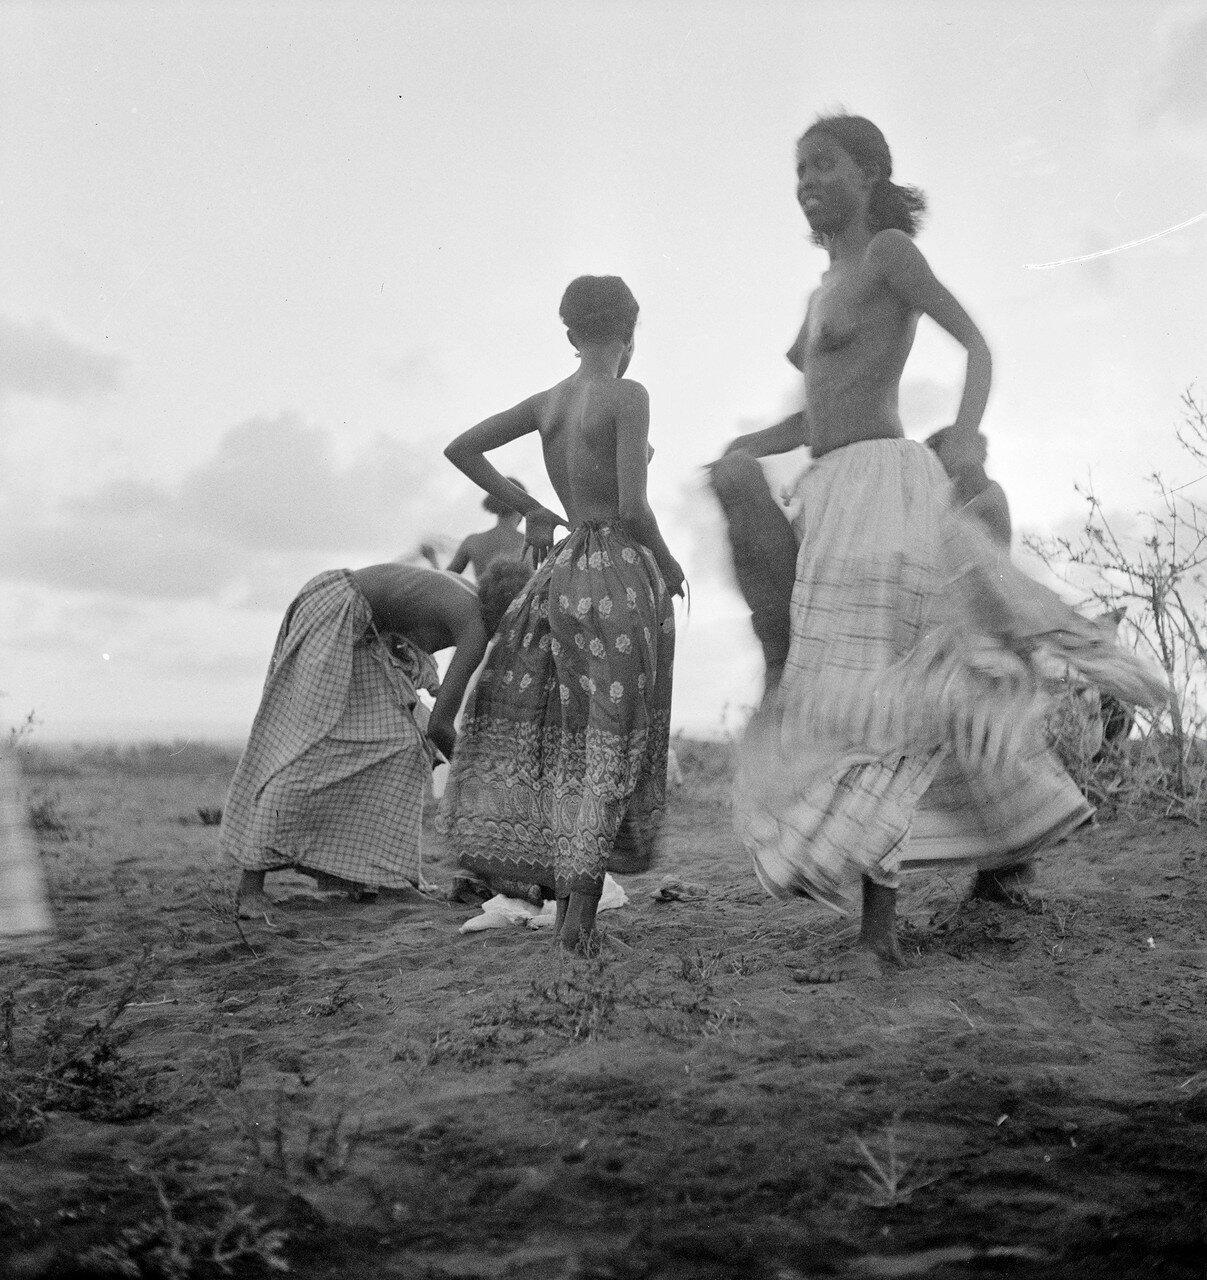 Девушки народности данакиль во время танца